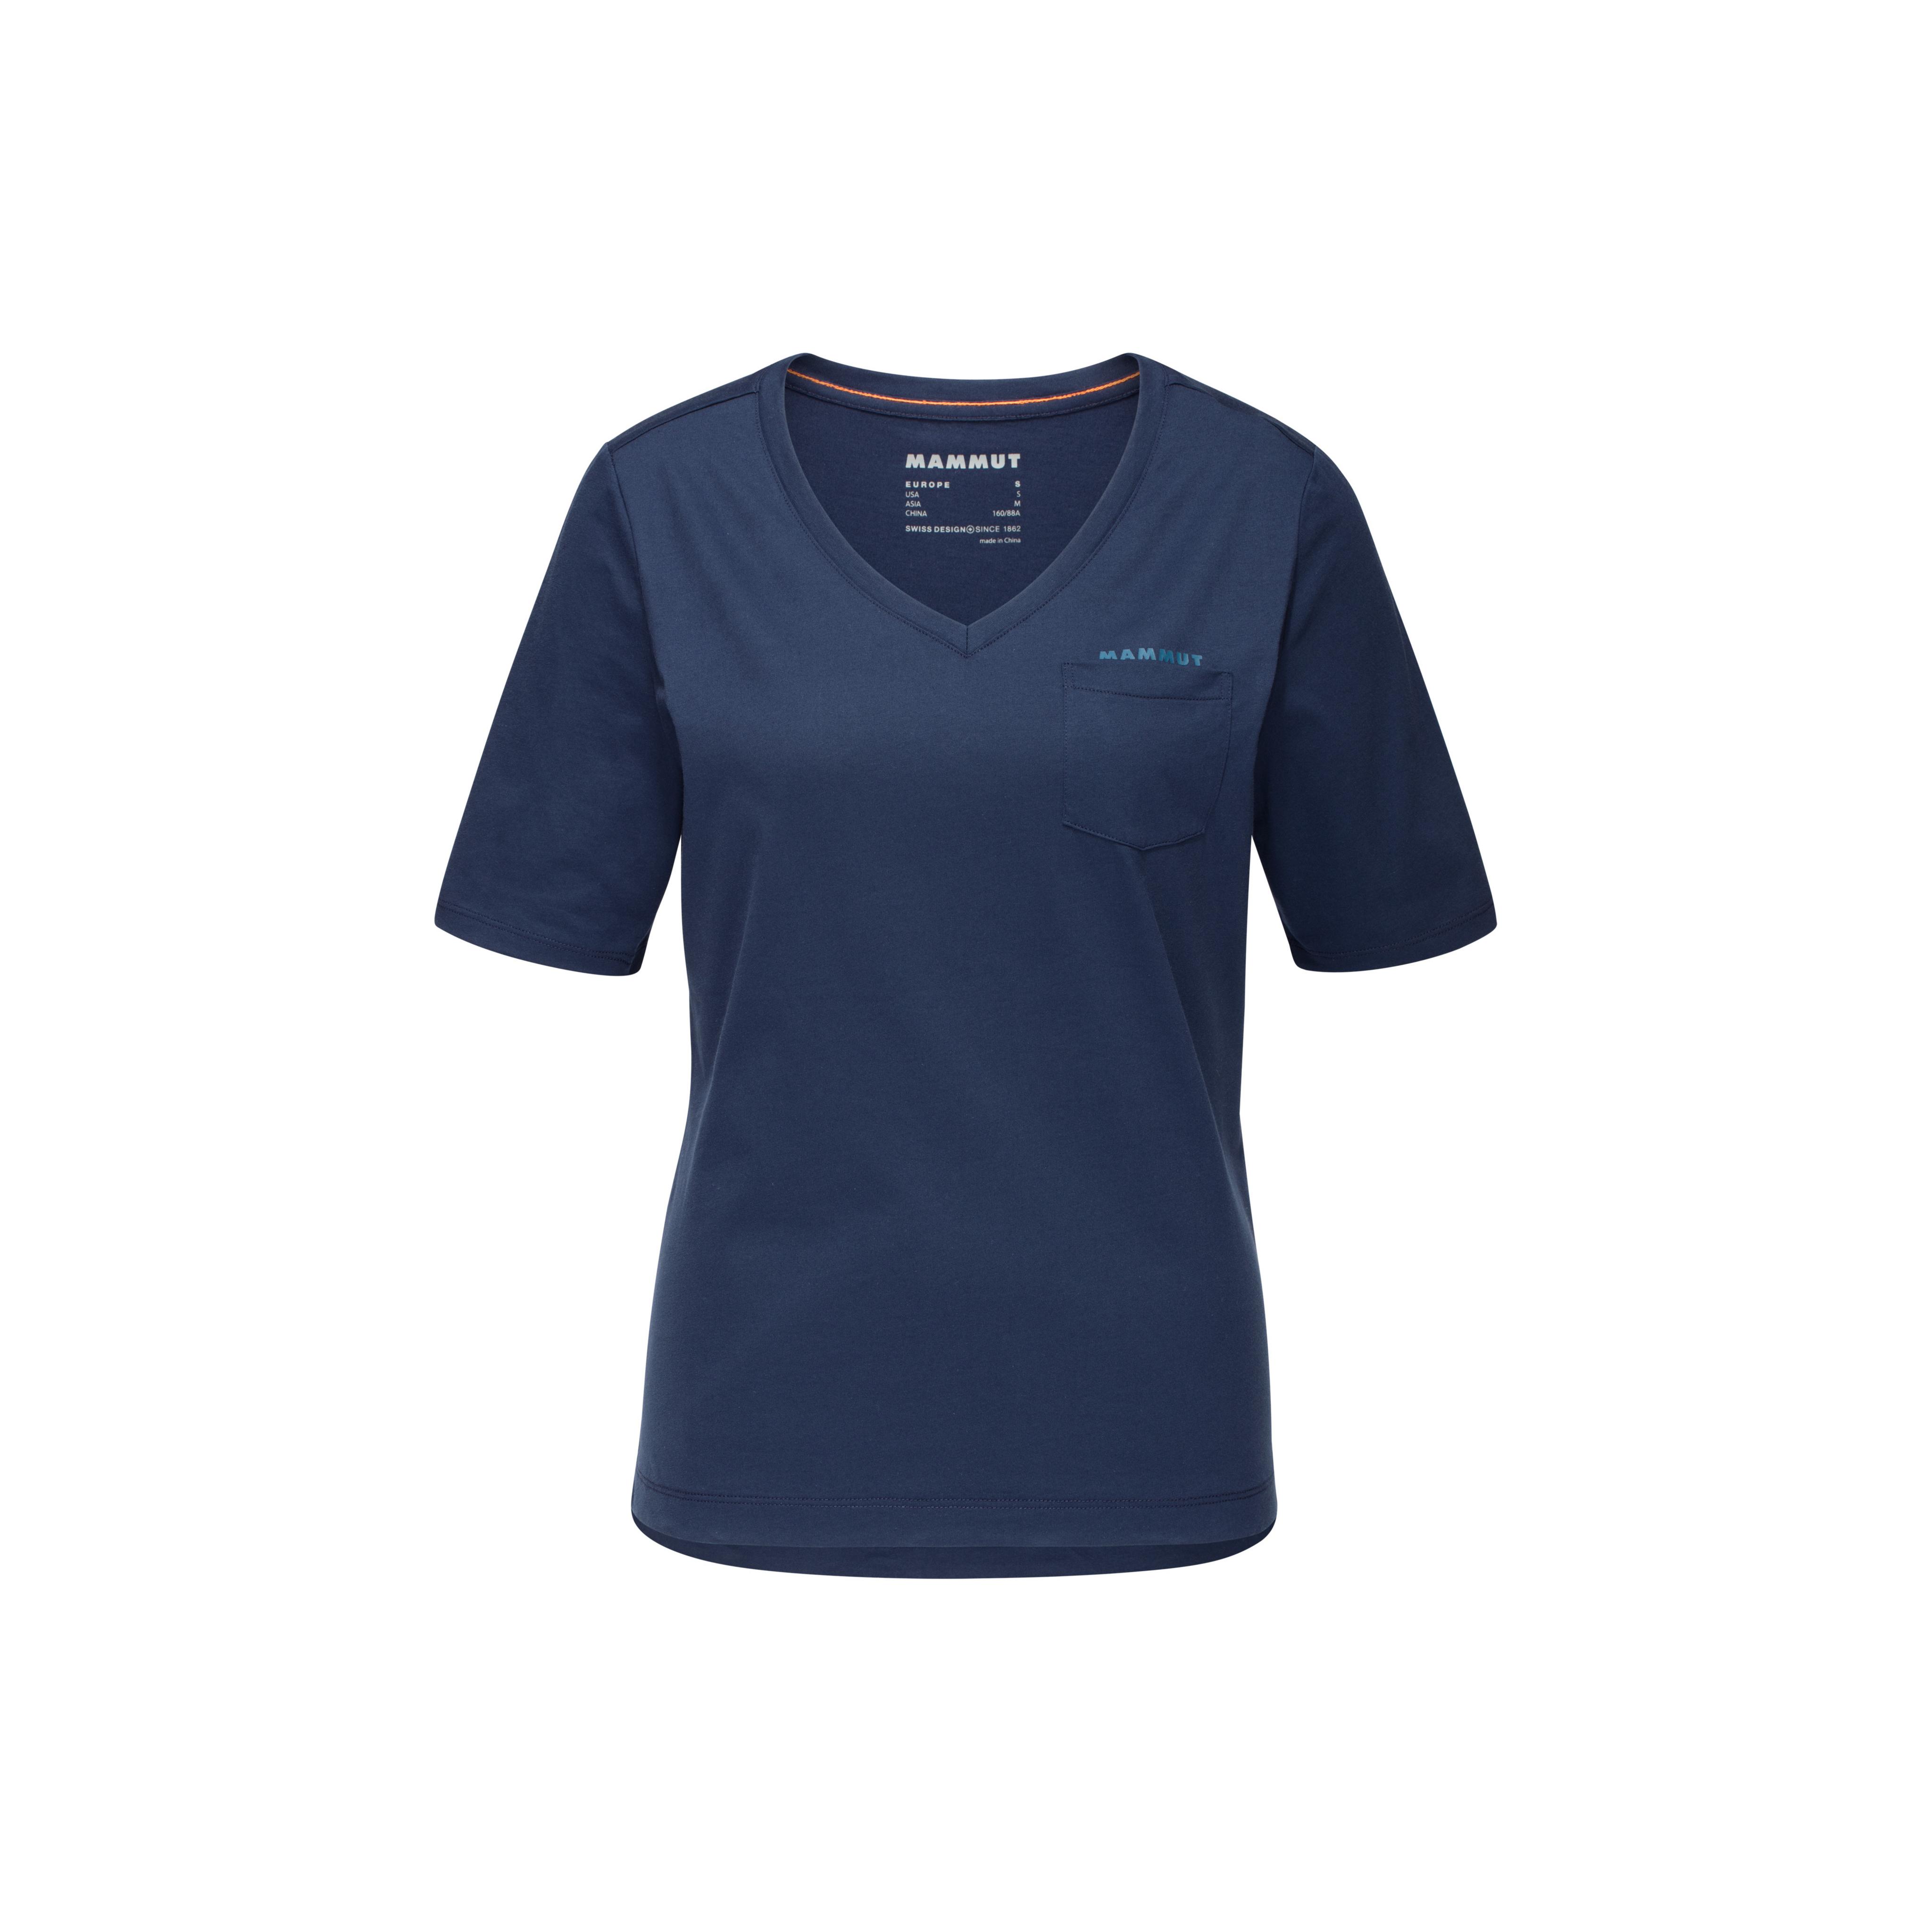 Mammut Pocket T-Shirt Women - marine, XS thumbnail